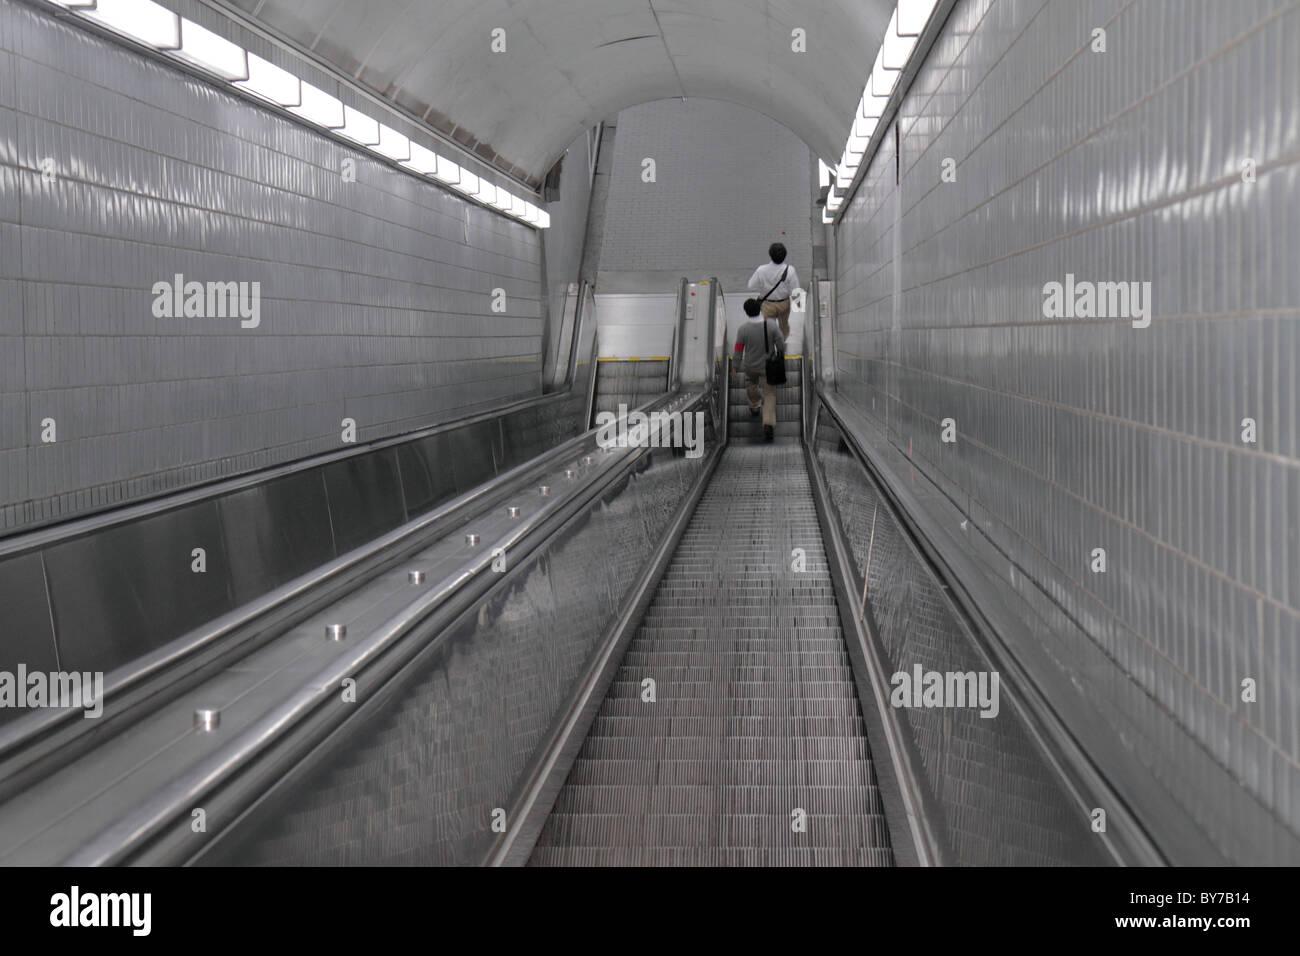 Atlanta Georgia MARTA Peachtree Center Station underground mass transit public transportation escalator down descend - Stock Image